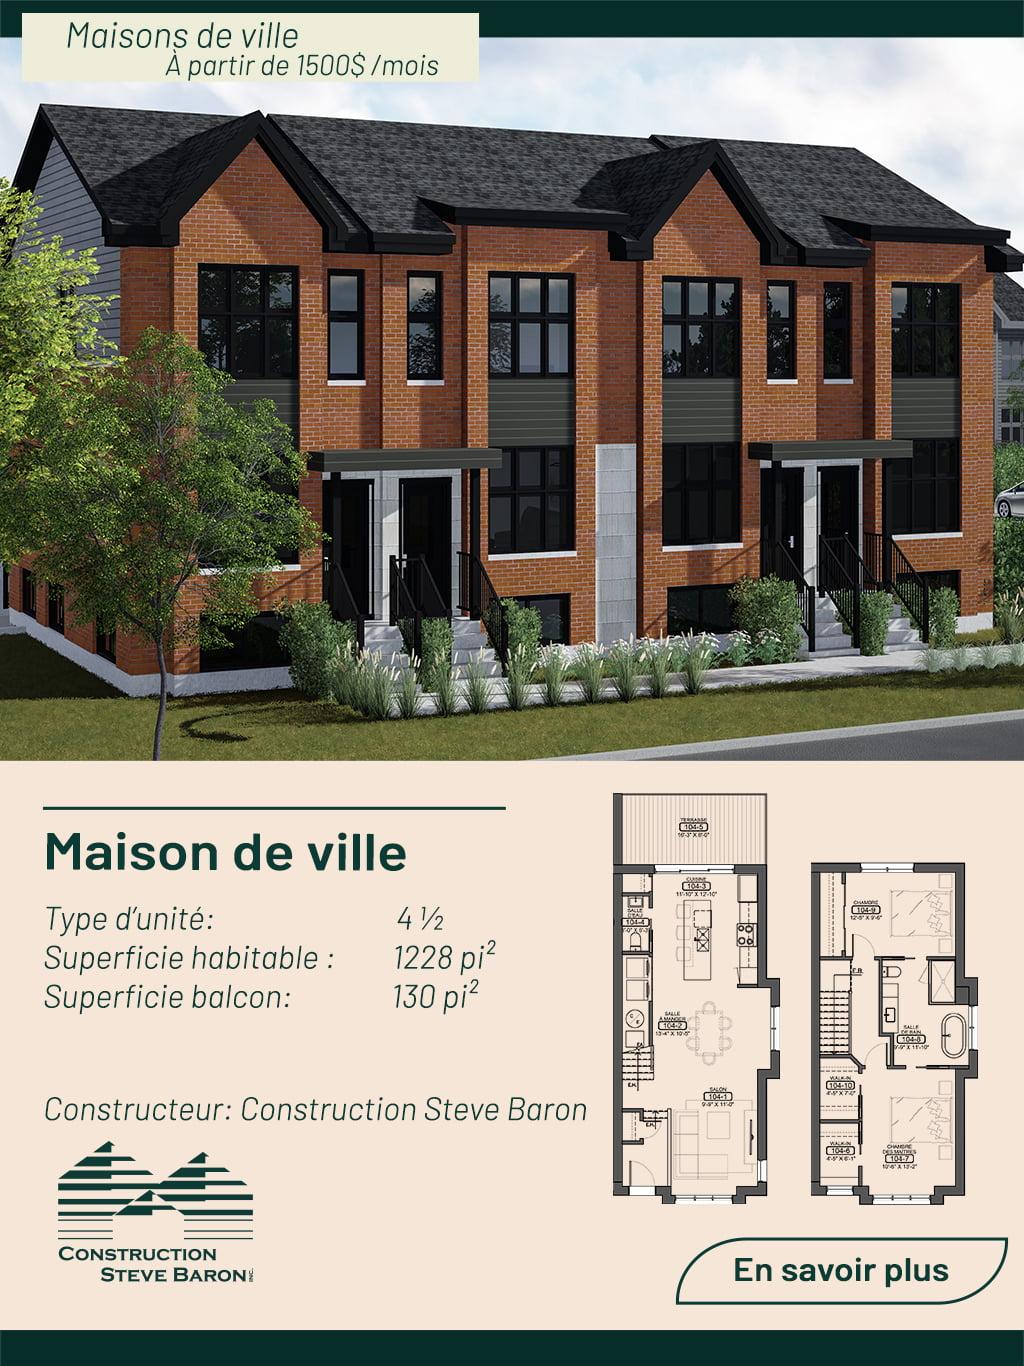 Contenu web_maison ville_modele_5_version mobile_1024